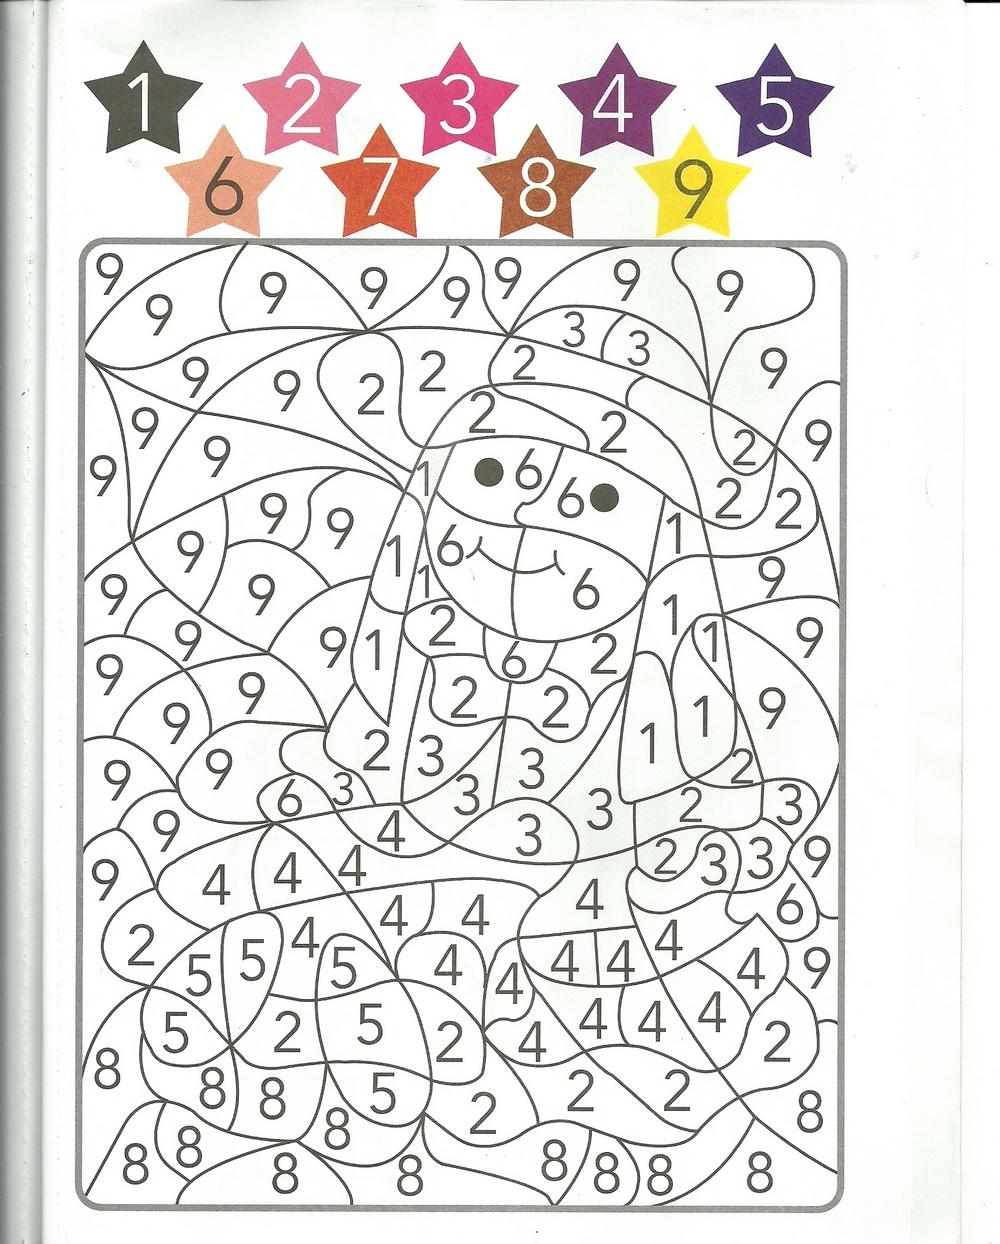 Ilkbahar Resmi Boyama Egitimhane Coloring Free To Print